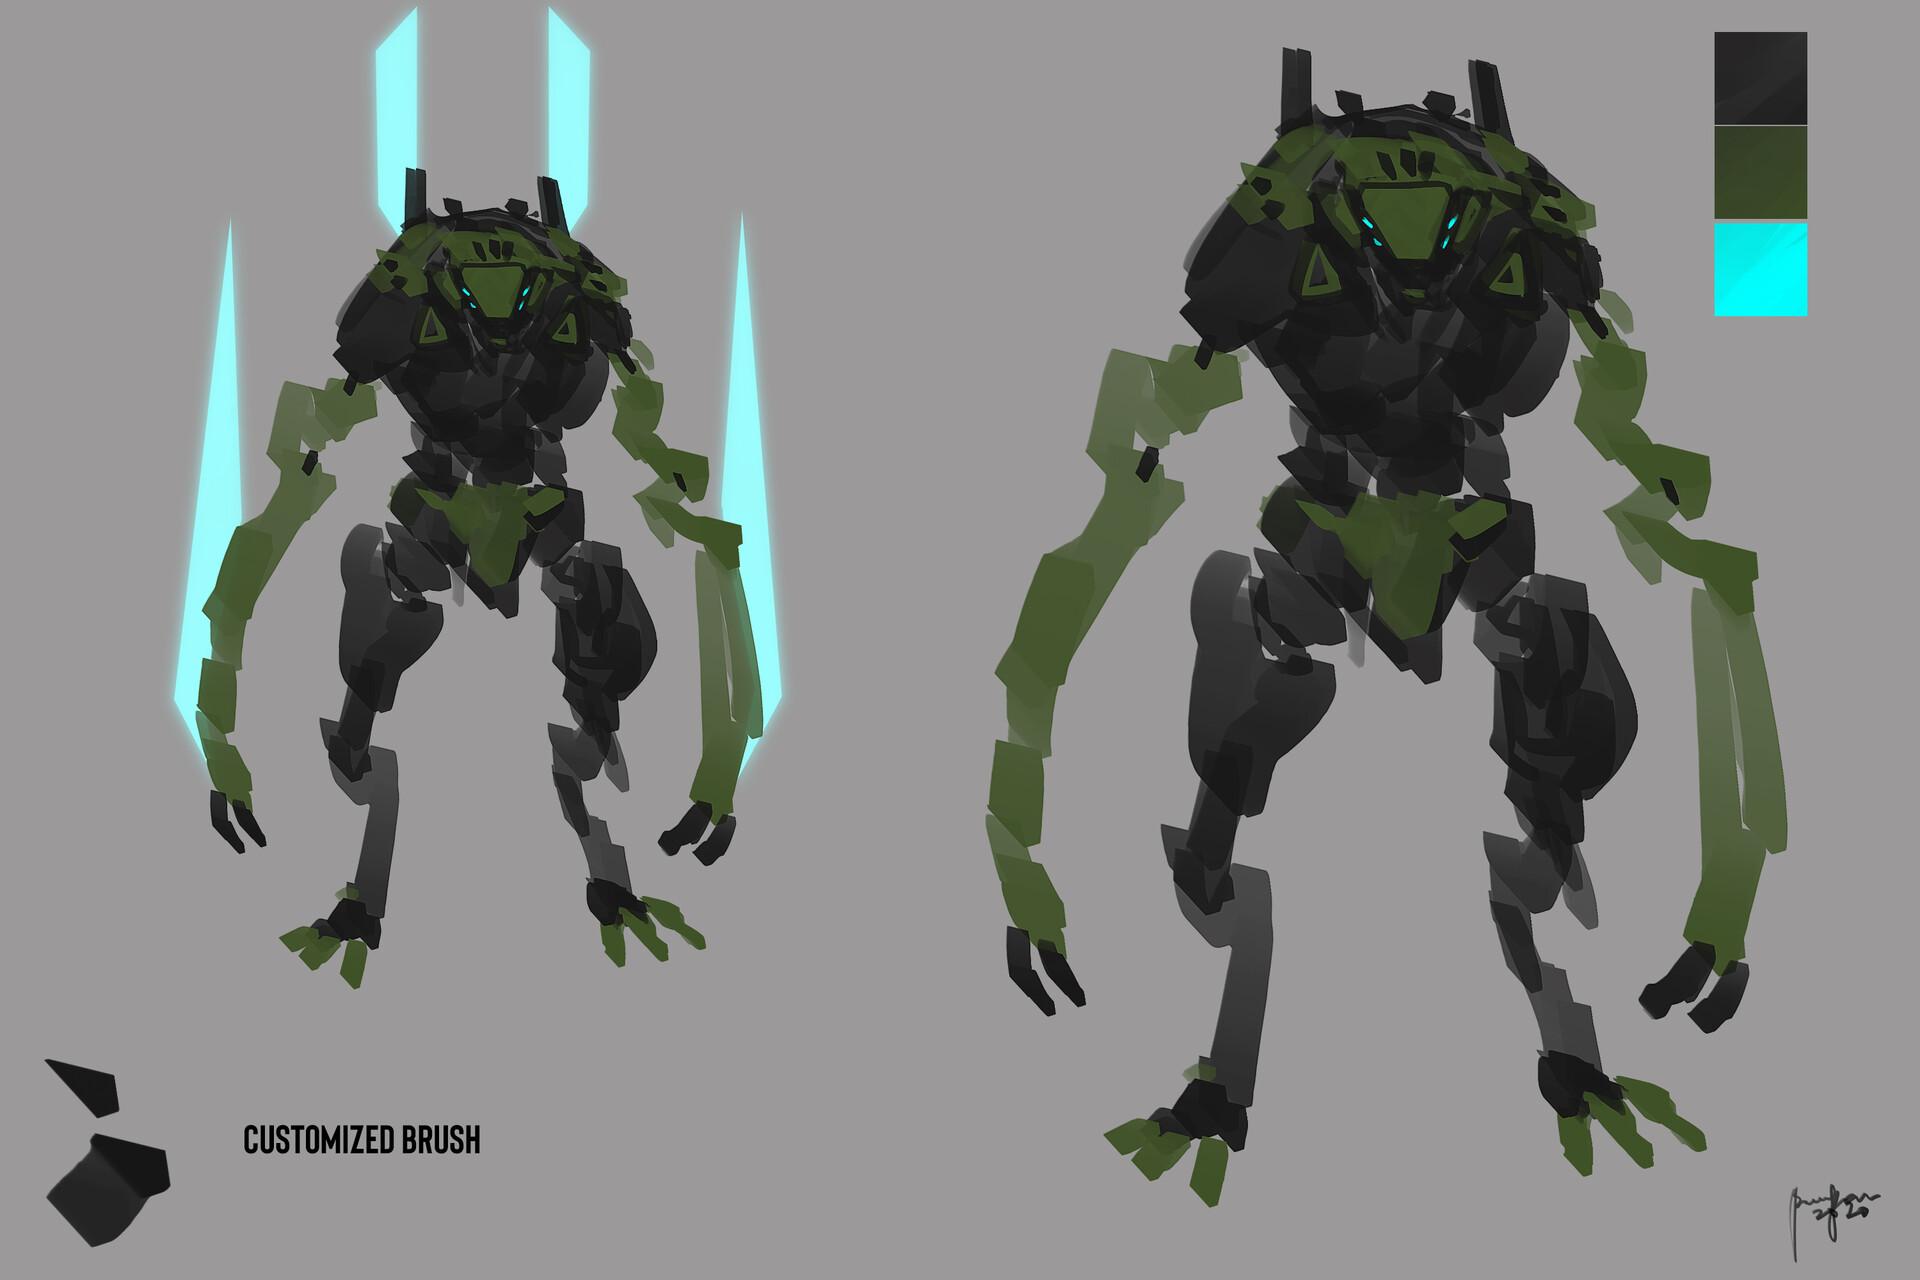 Mechanized Feral Concept BRAWL